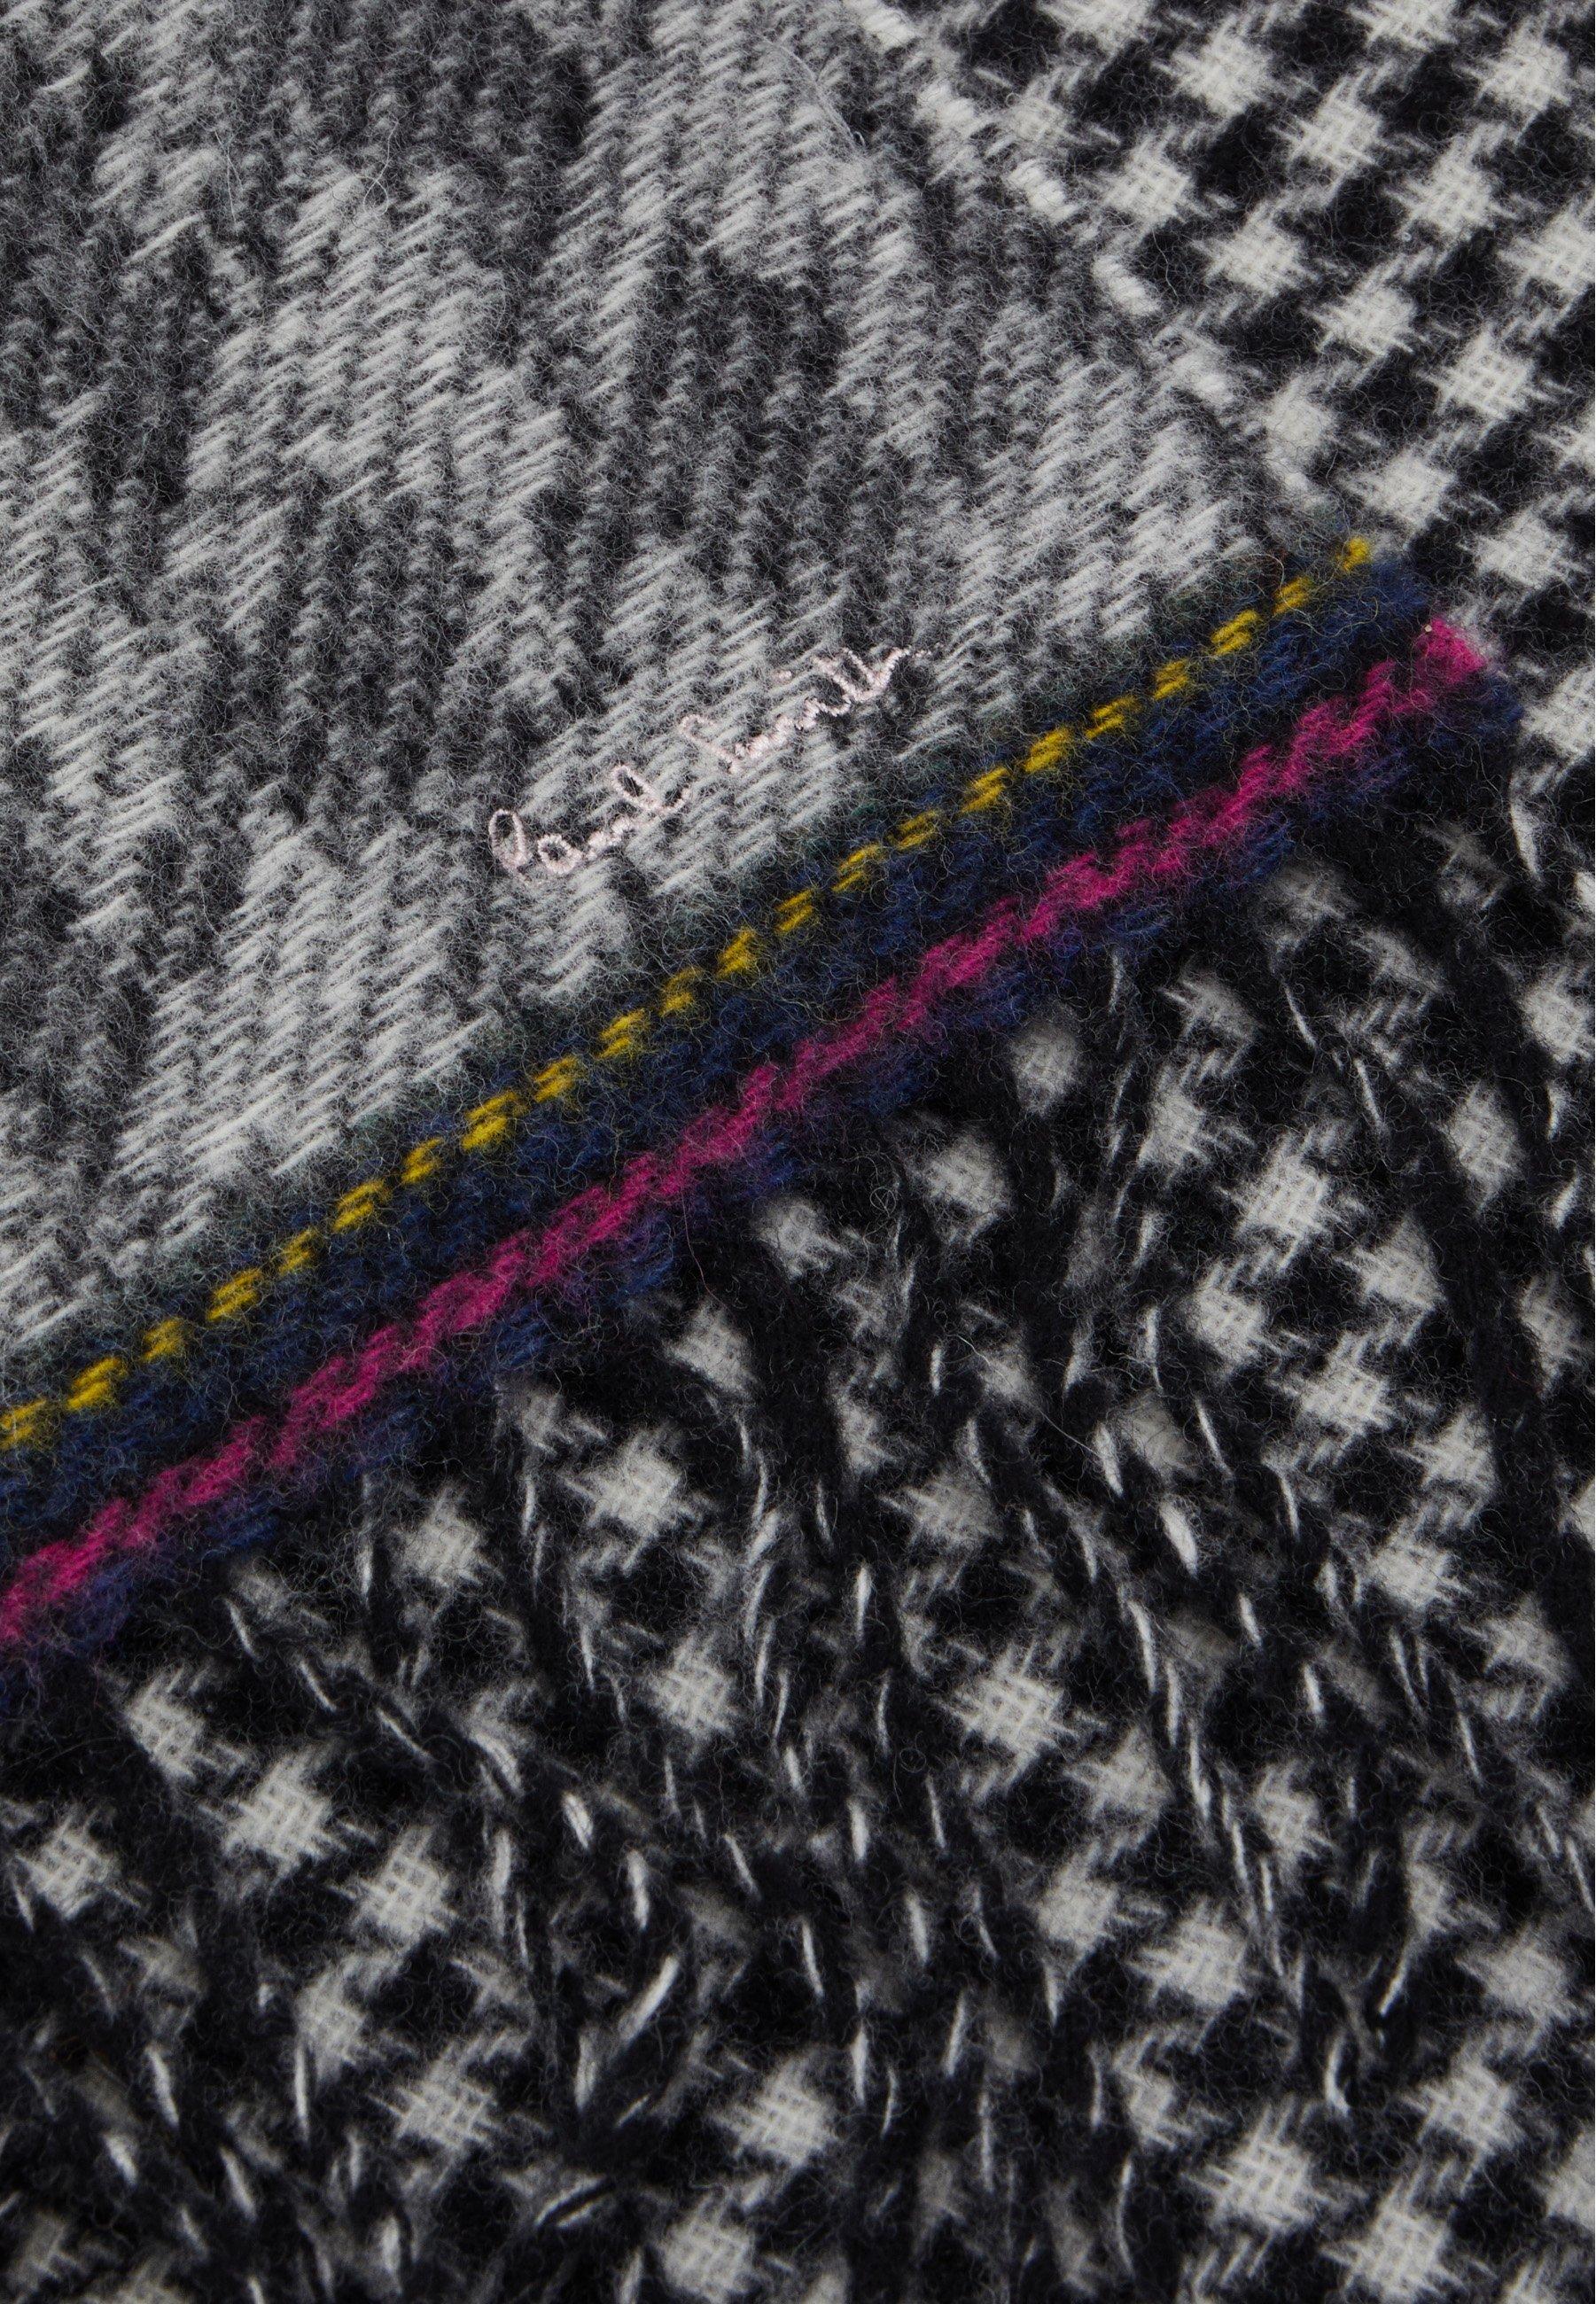 Paul Smith Women Scarf Double Houndstooth - Schal Black/white/pink/schwarz